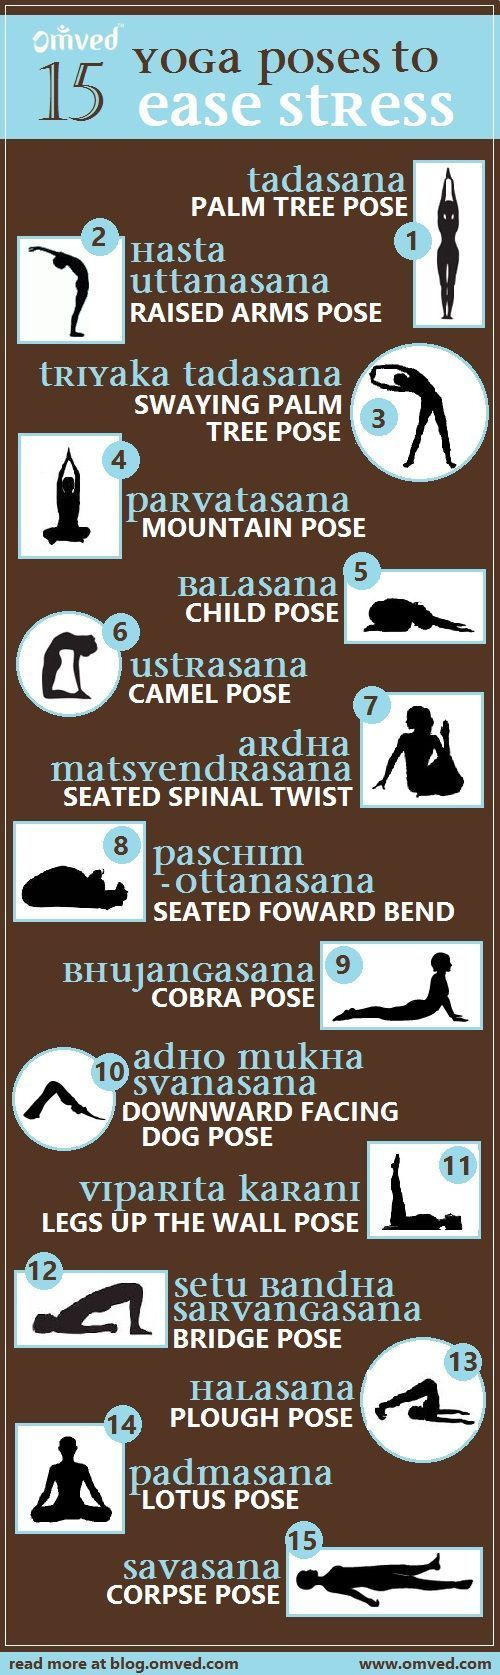 15 Yoga Poses To Ease Stress